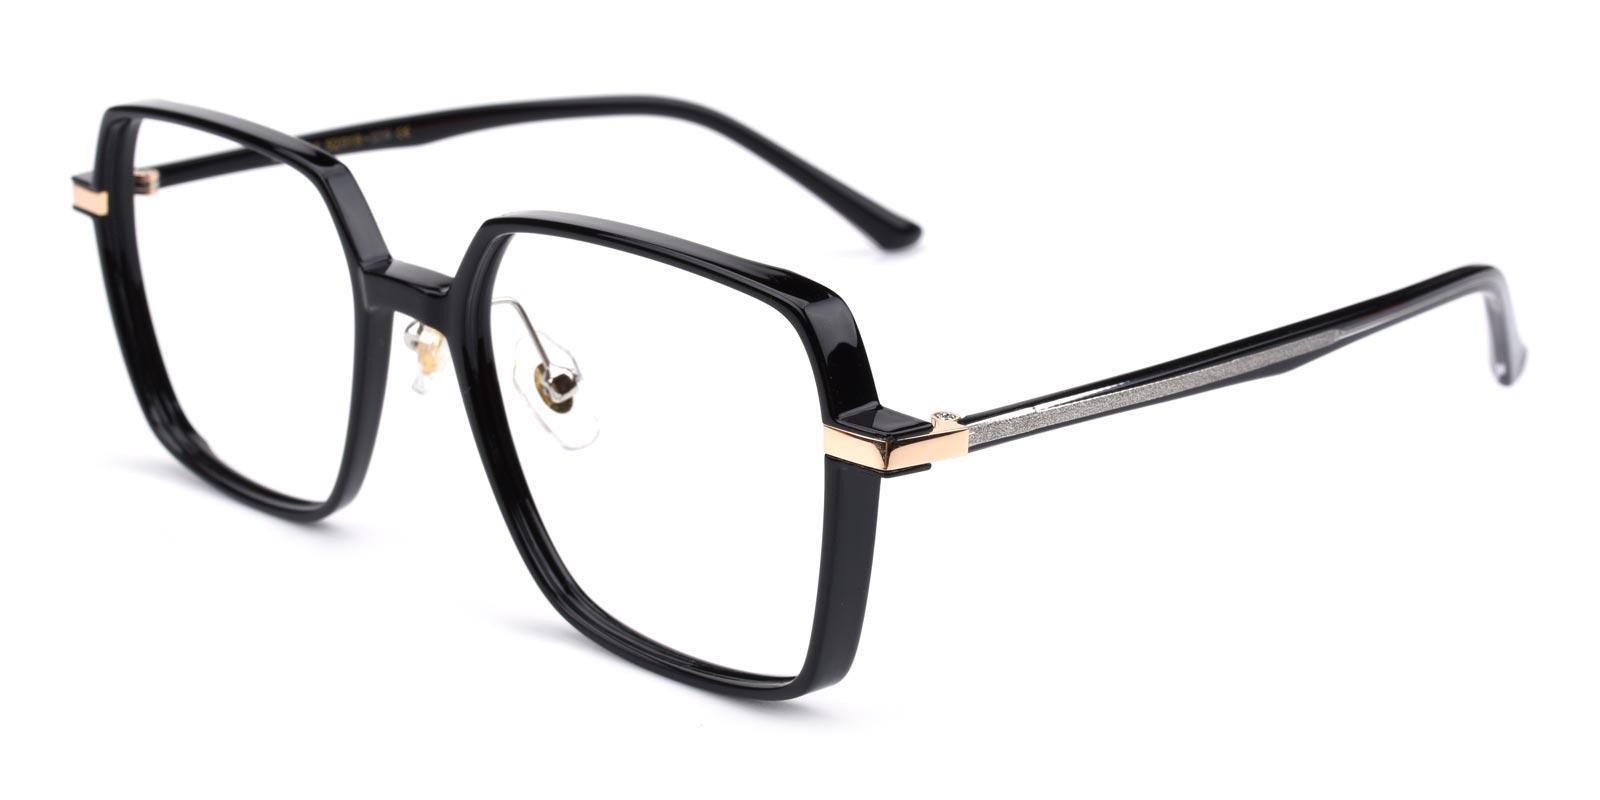 Decent-Black-Geometric-Acetate-Eyeglasses-additional1